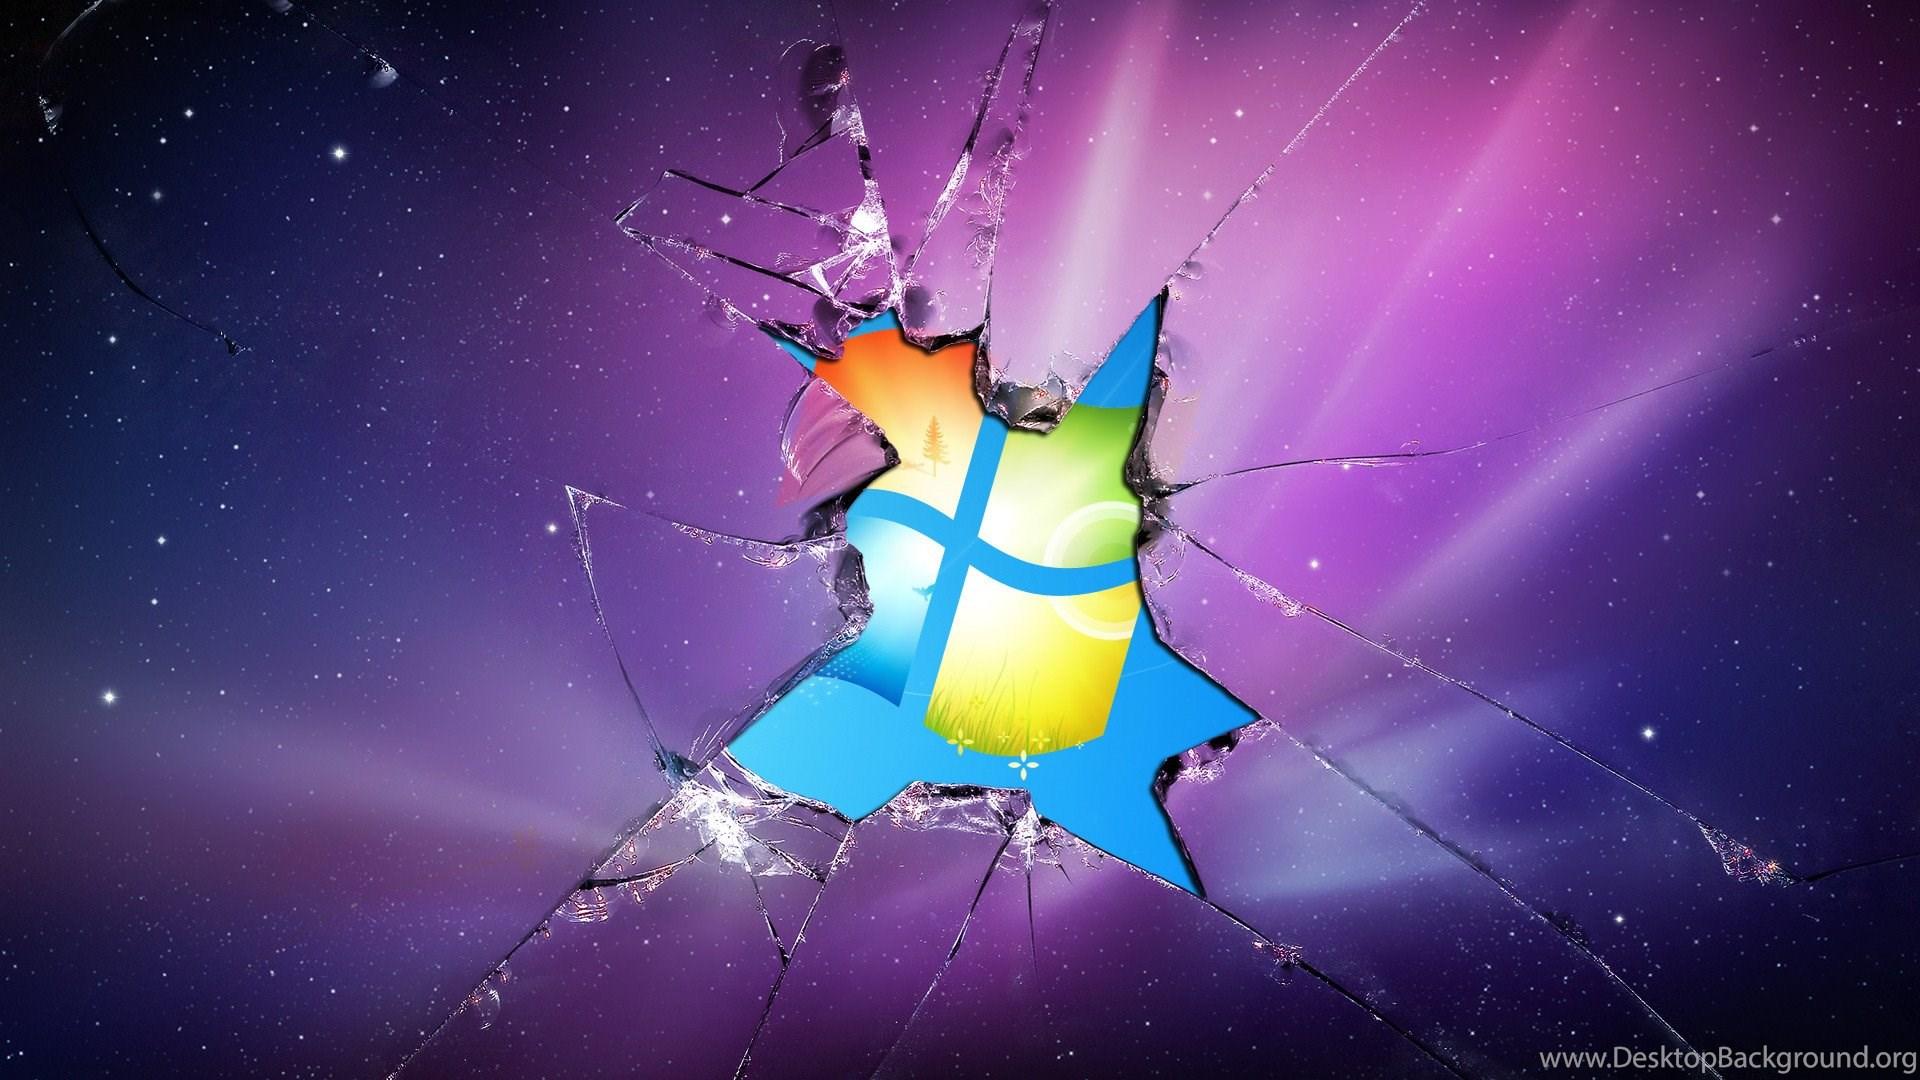 Realistic cracked screen wallpapers wide for desktop uncalke popular voltagebd Image collections